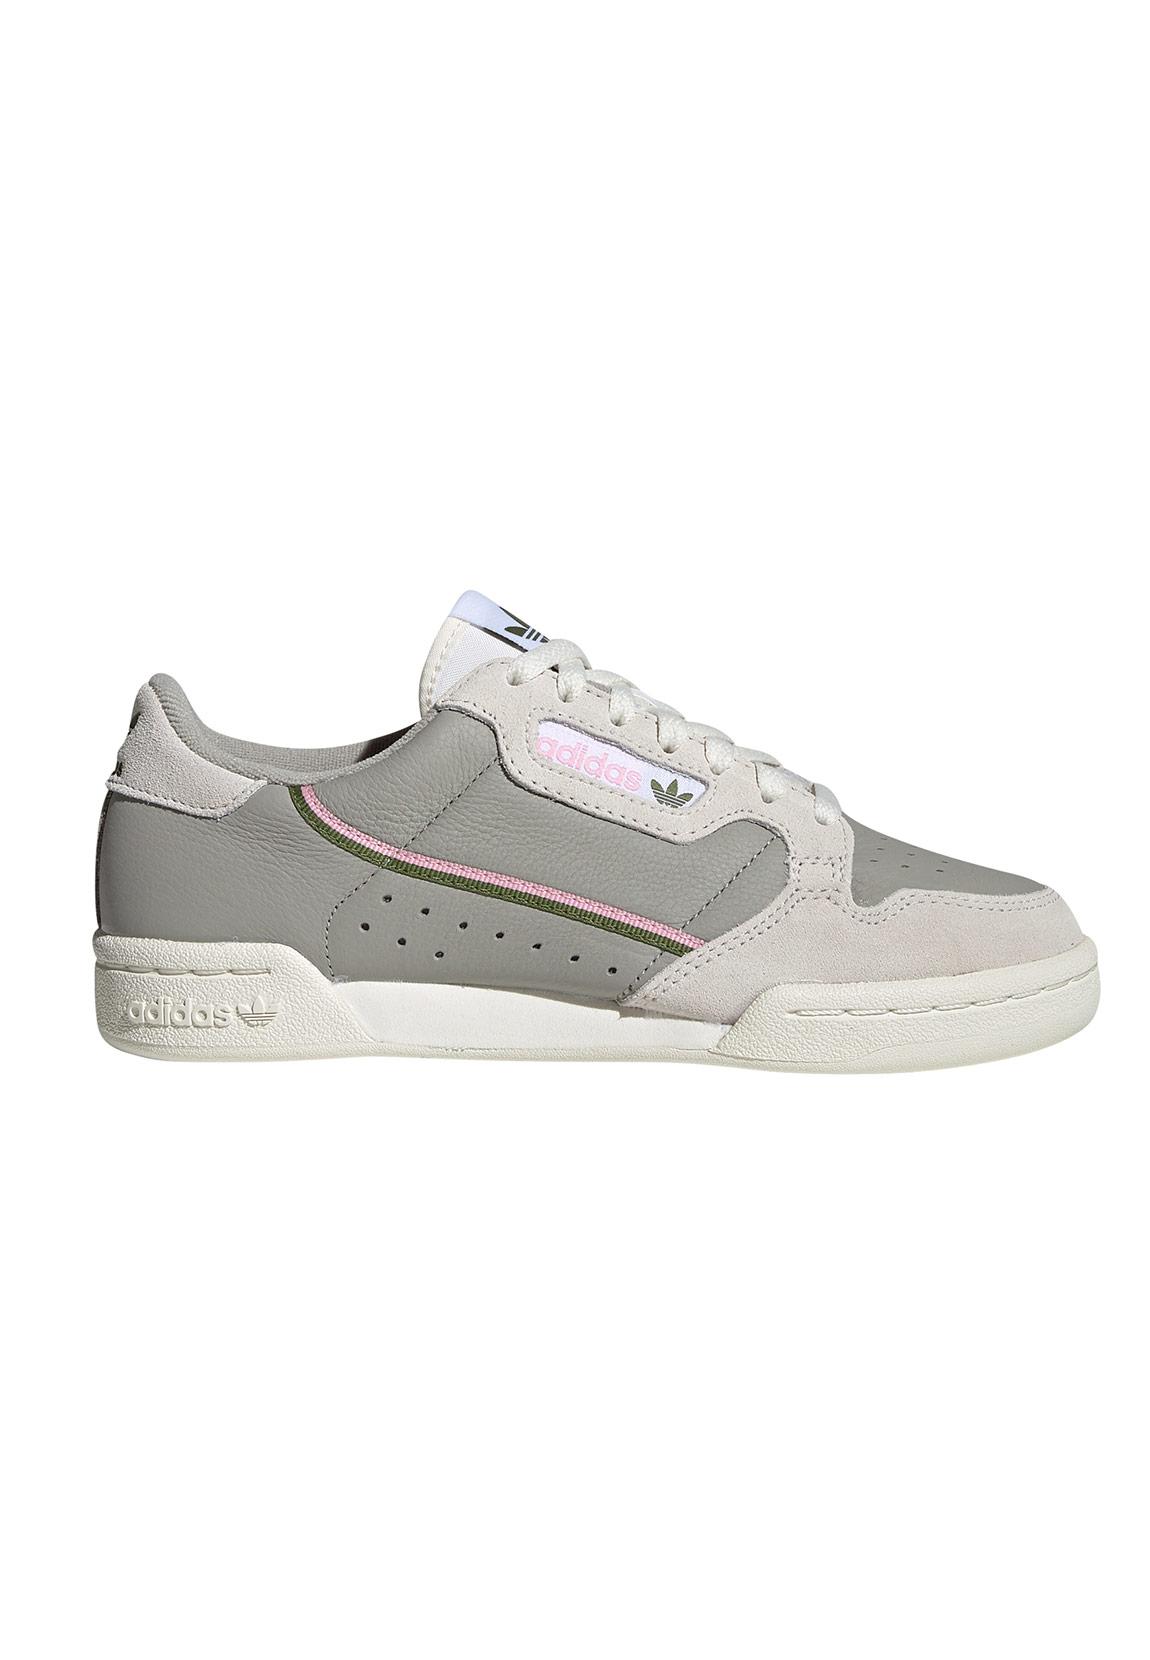 Adidas Originals Sneaker Damen CONTINENTAL 80 W EE5558 Grau